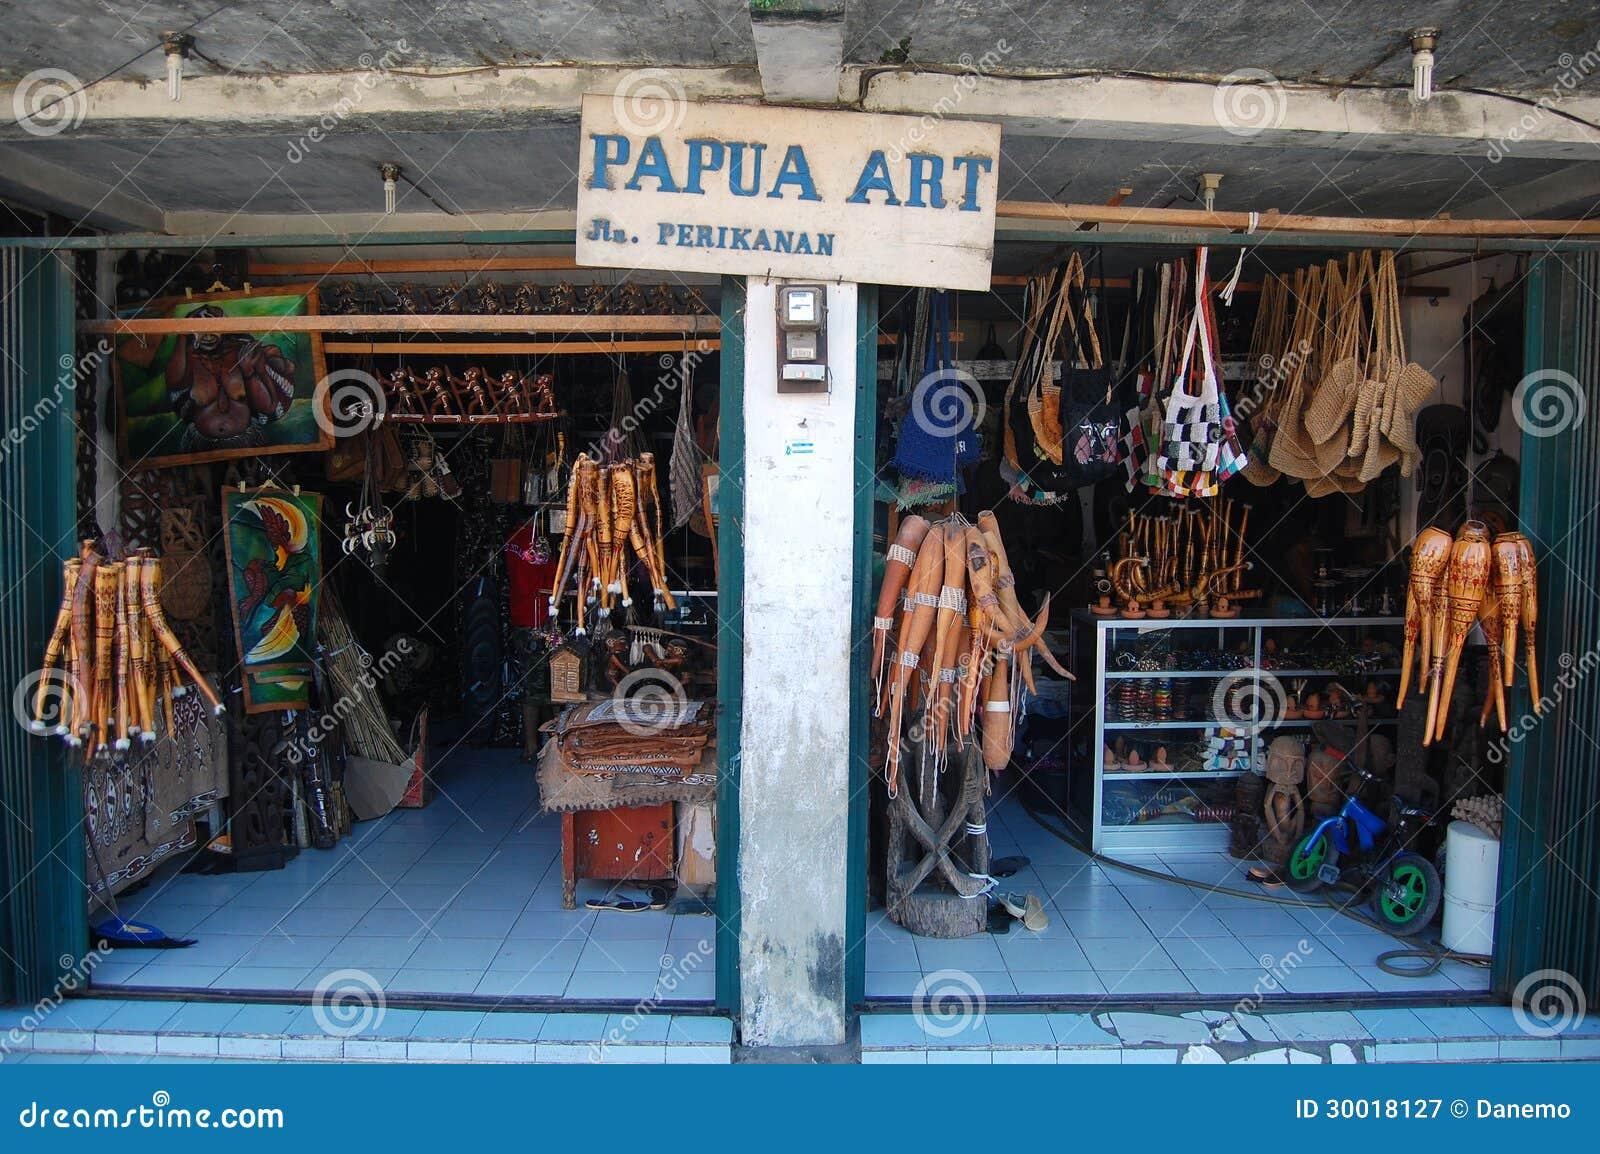 Papua art gift shop Jayapura